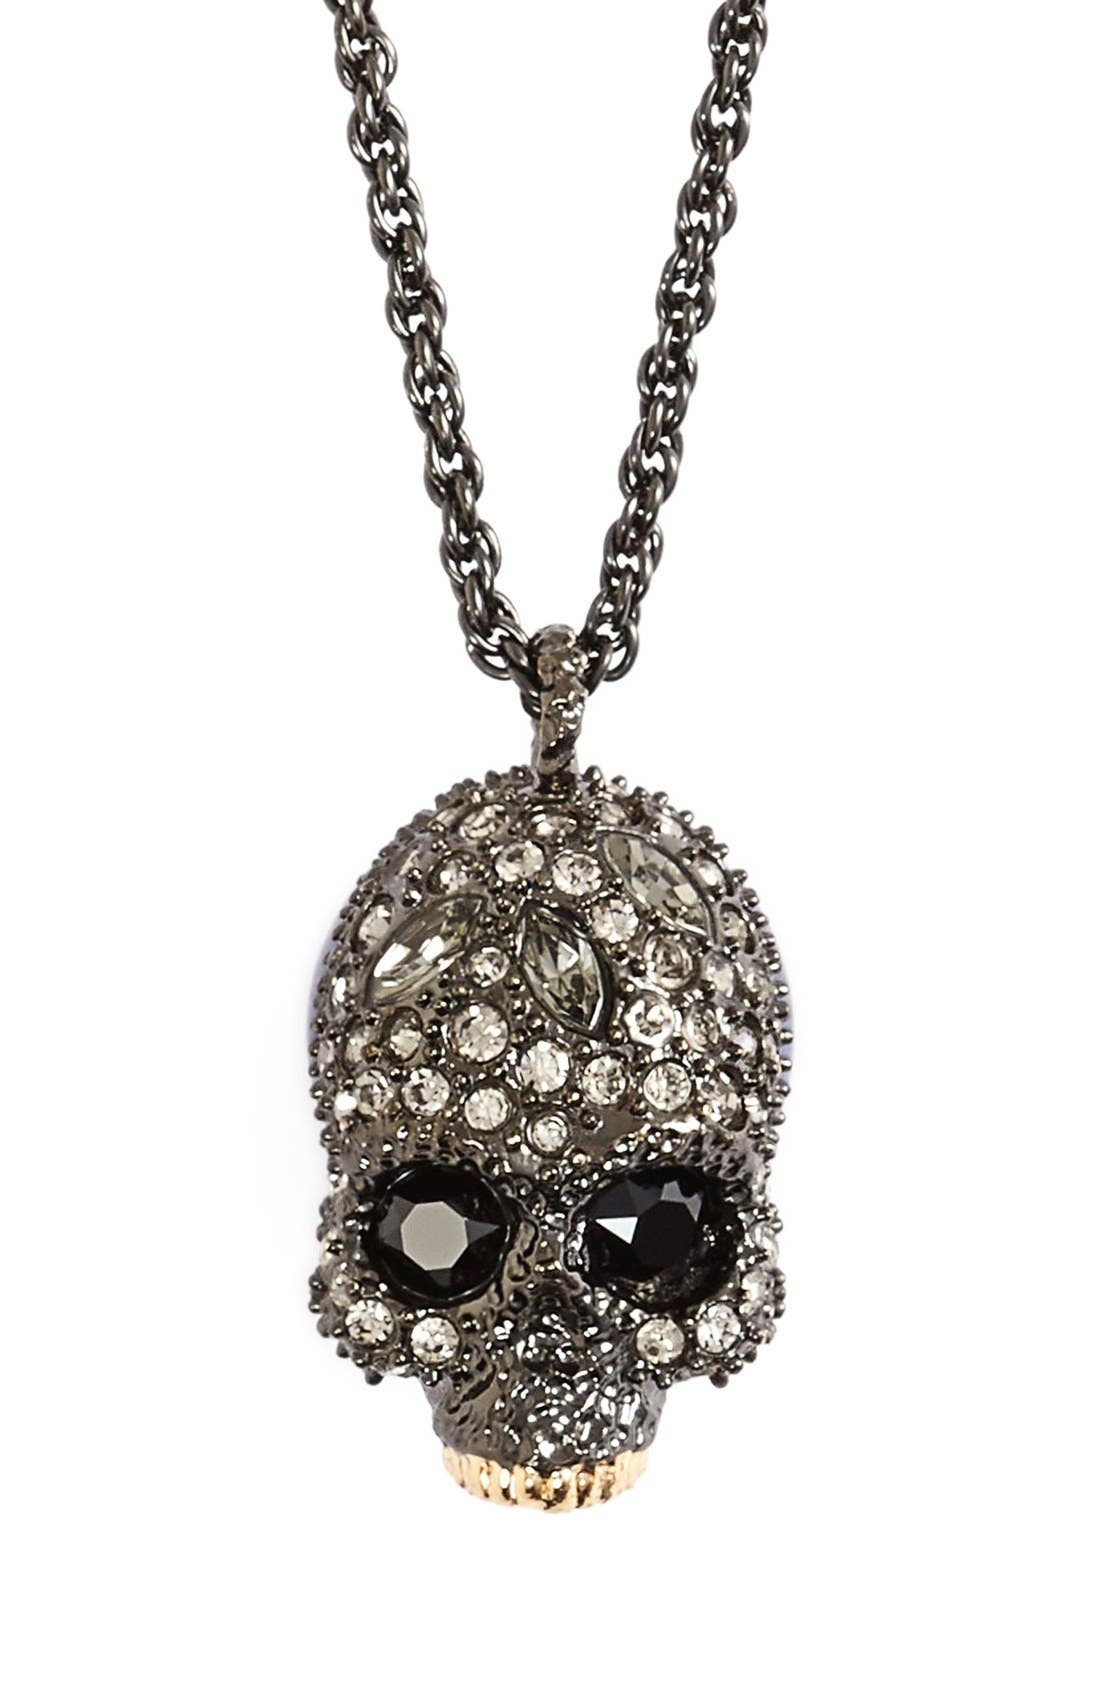 Alternate Image 1 Selected - Alexis Bittar'Skull' Pendant Necklace